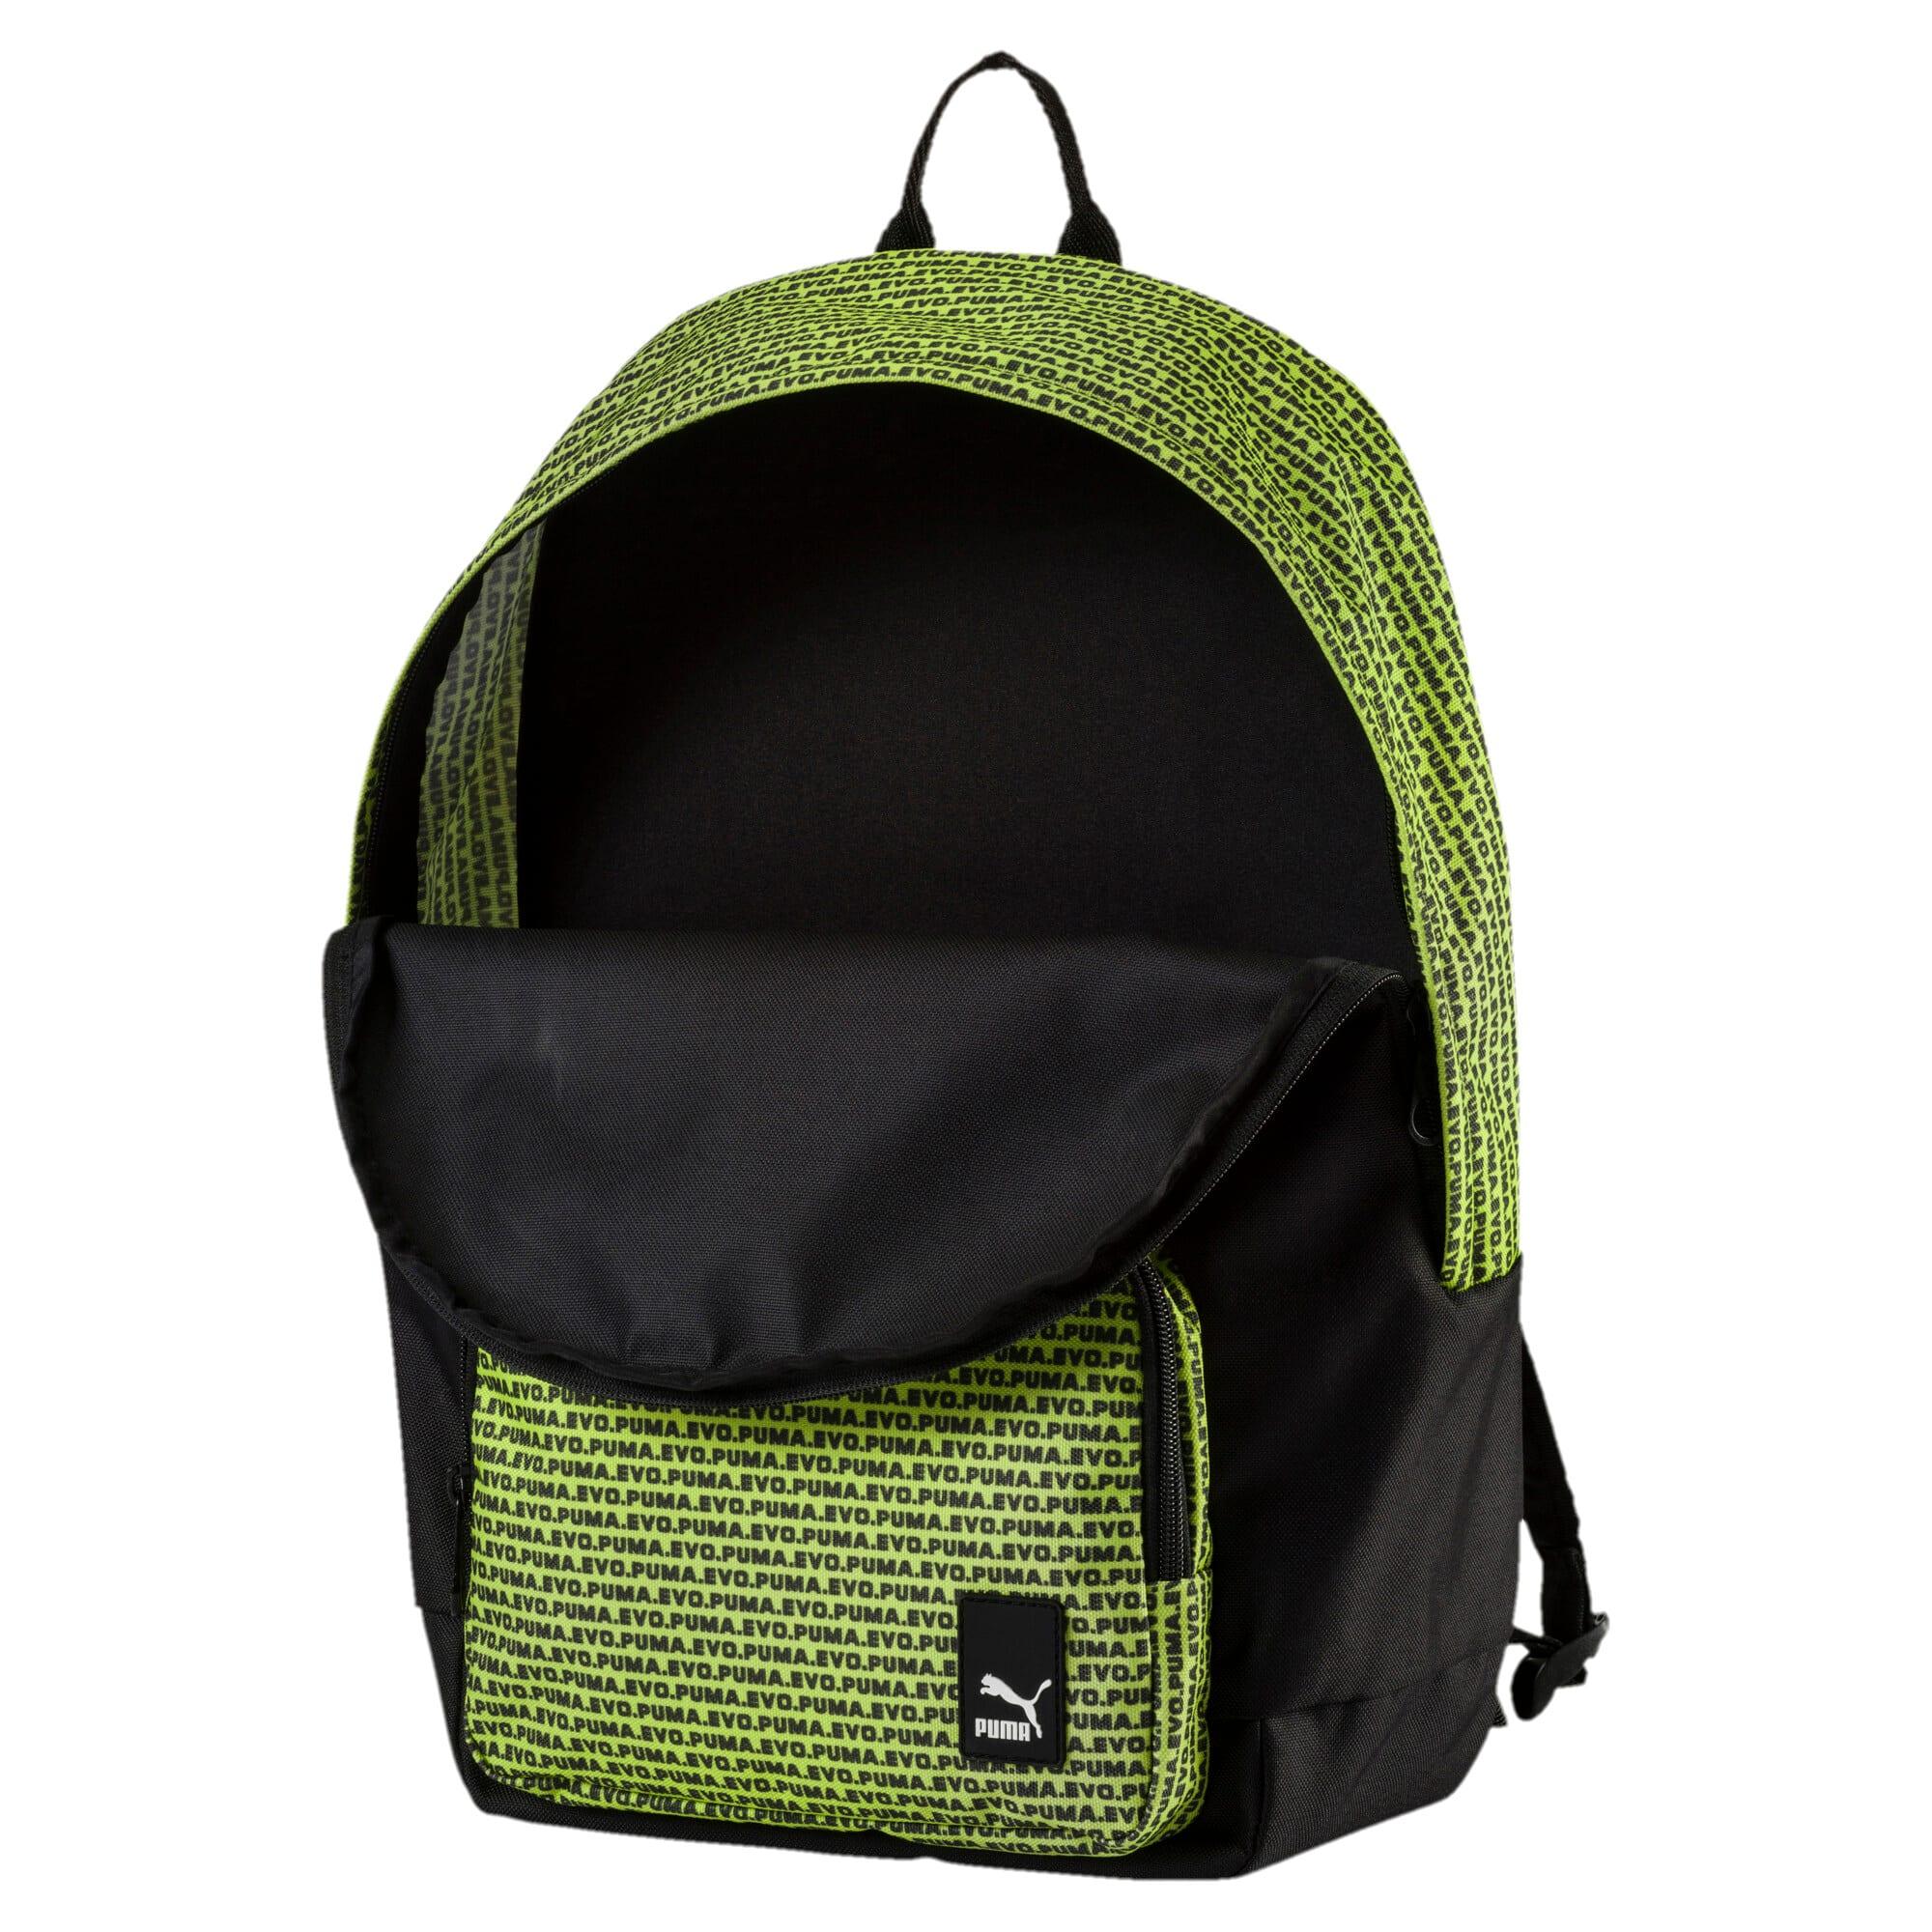 Thumbnail 3 of Prime Backpack, Puma Black-Evo graphic, medium-IND